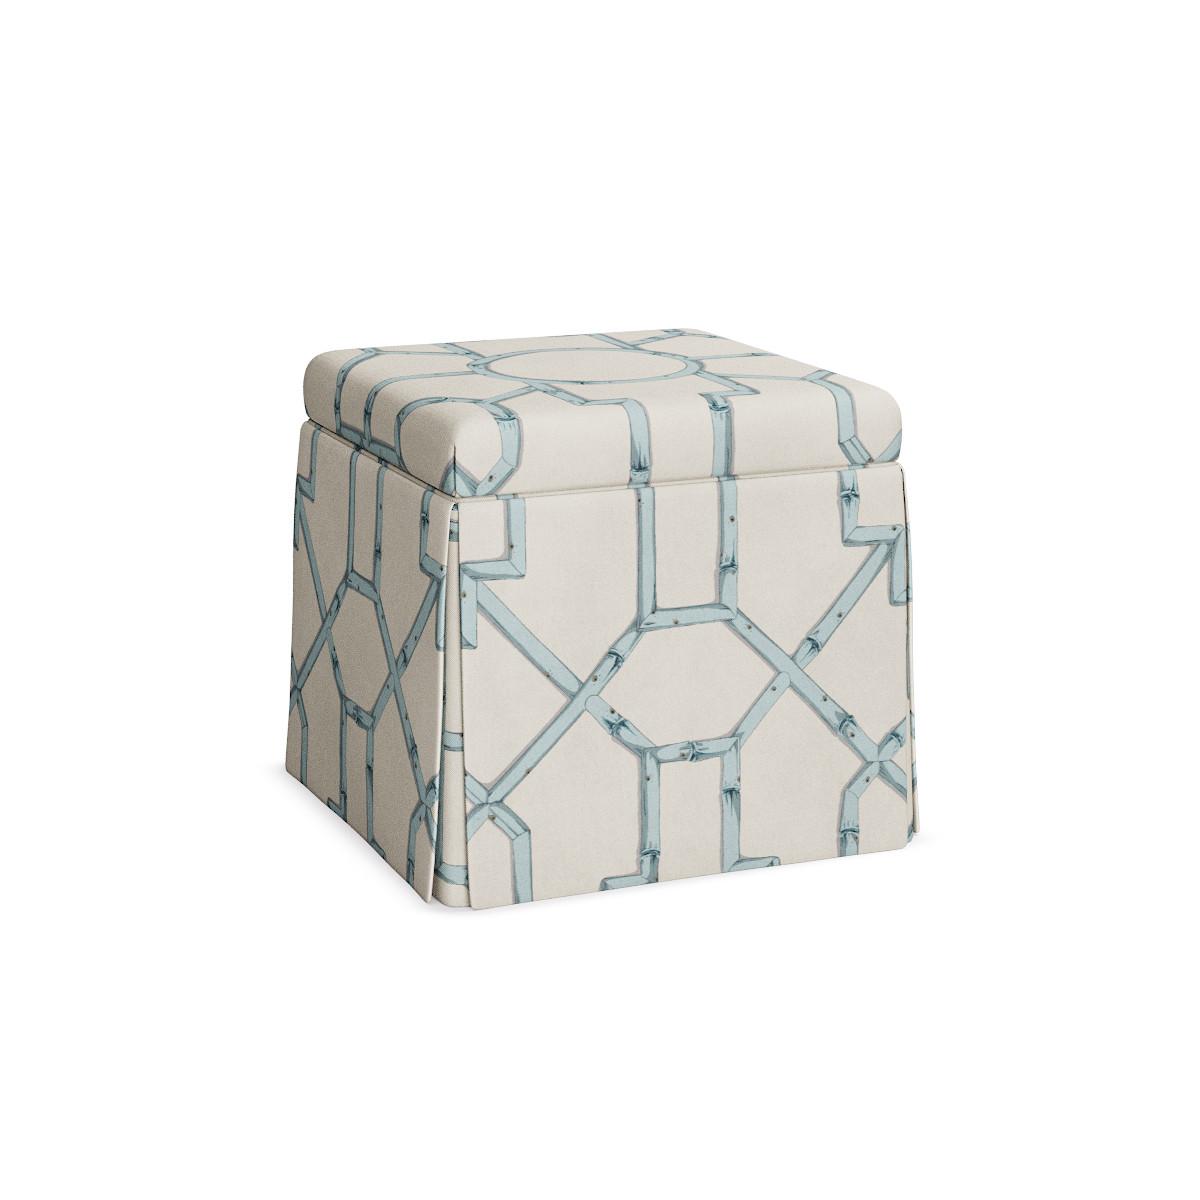 Surprising Skirted Storage Ottoman Blue Baldwin Bamboo Inzonedesignstudio Interior Chair Design Inzonedesignstudiocom